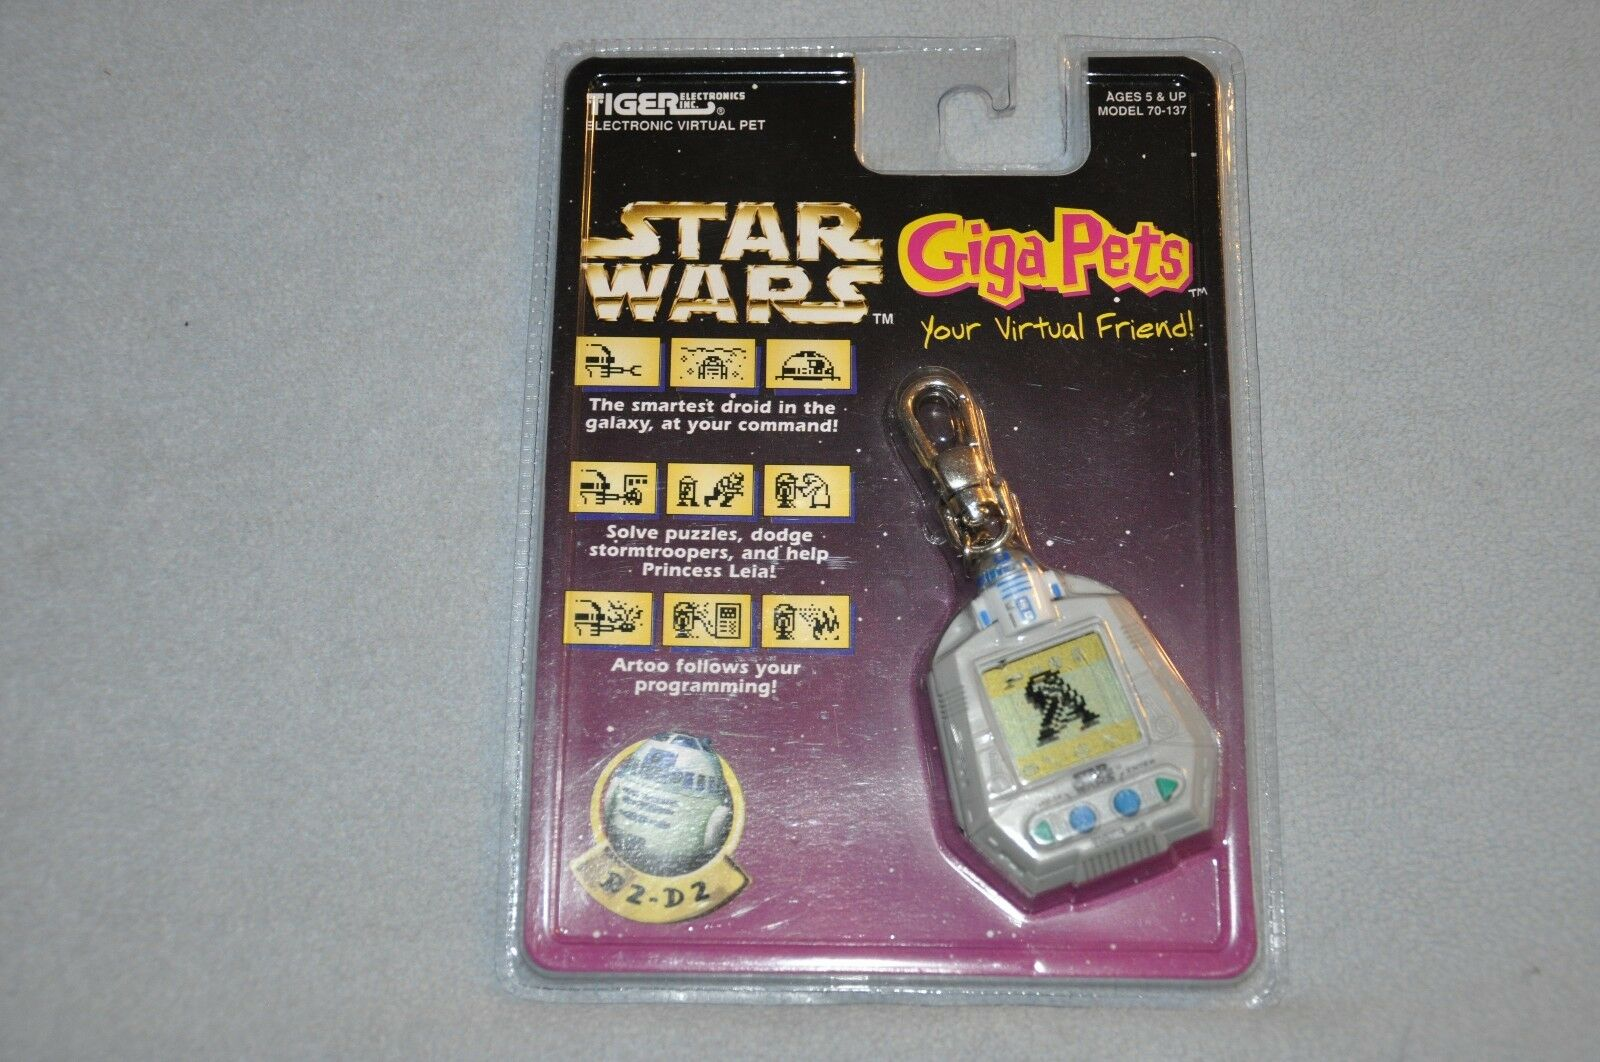 Star Wars R2-D2 Giga Pet Tiger Electronics Keychain